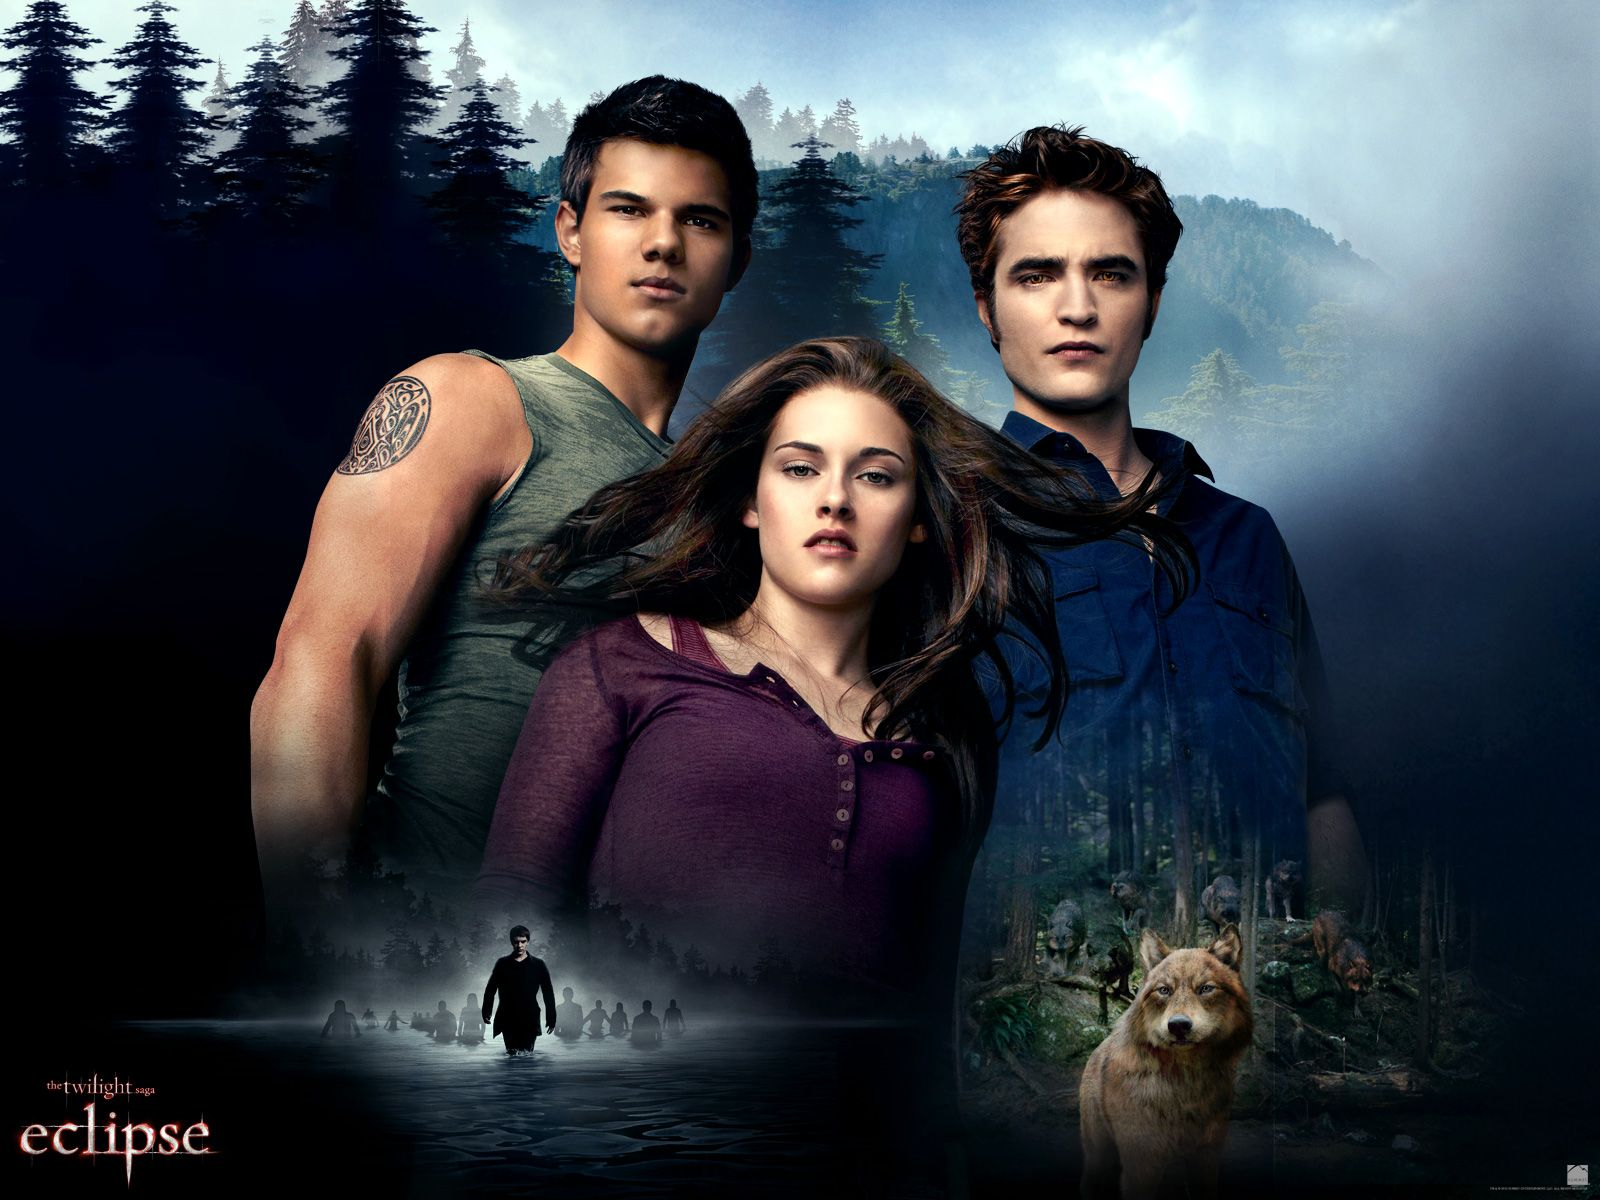 Pin De Ramona Lapoint En The Twilight Saga Eclipse Crepusculo Portadas Peliculas